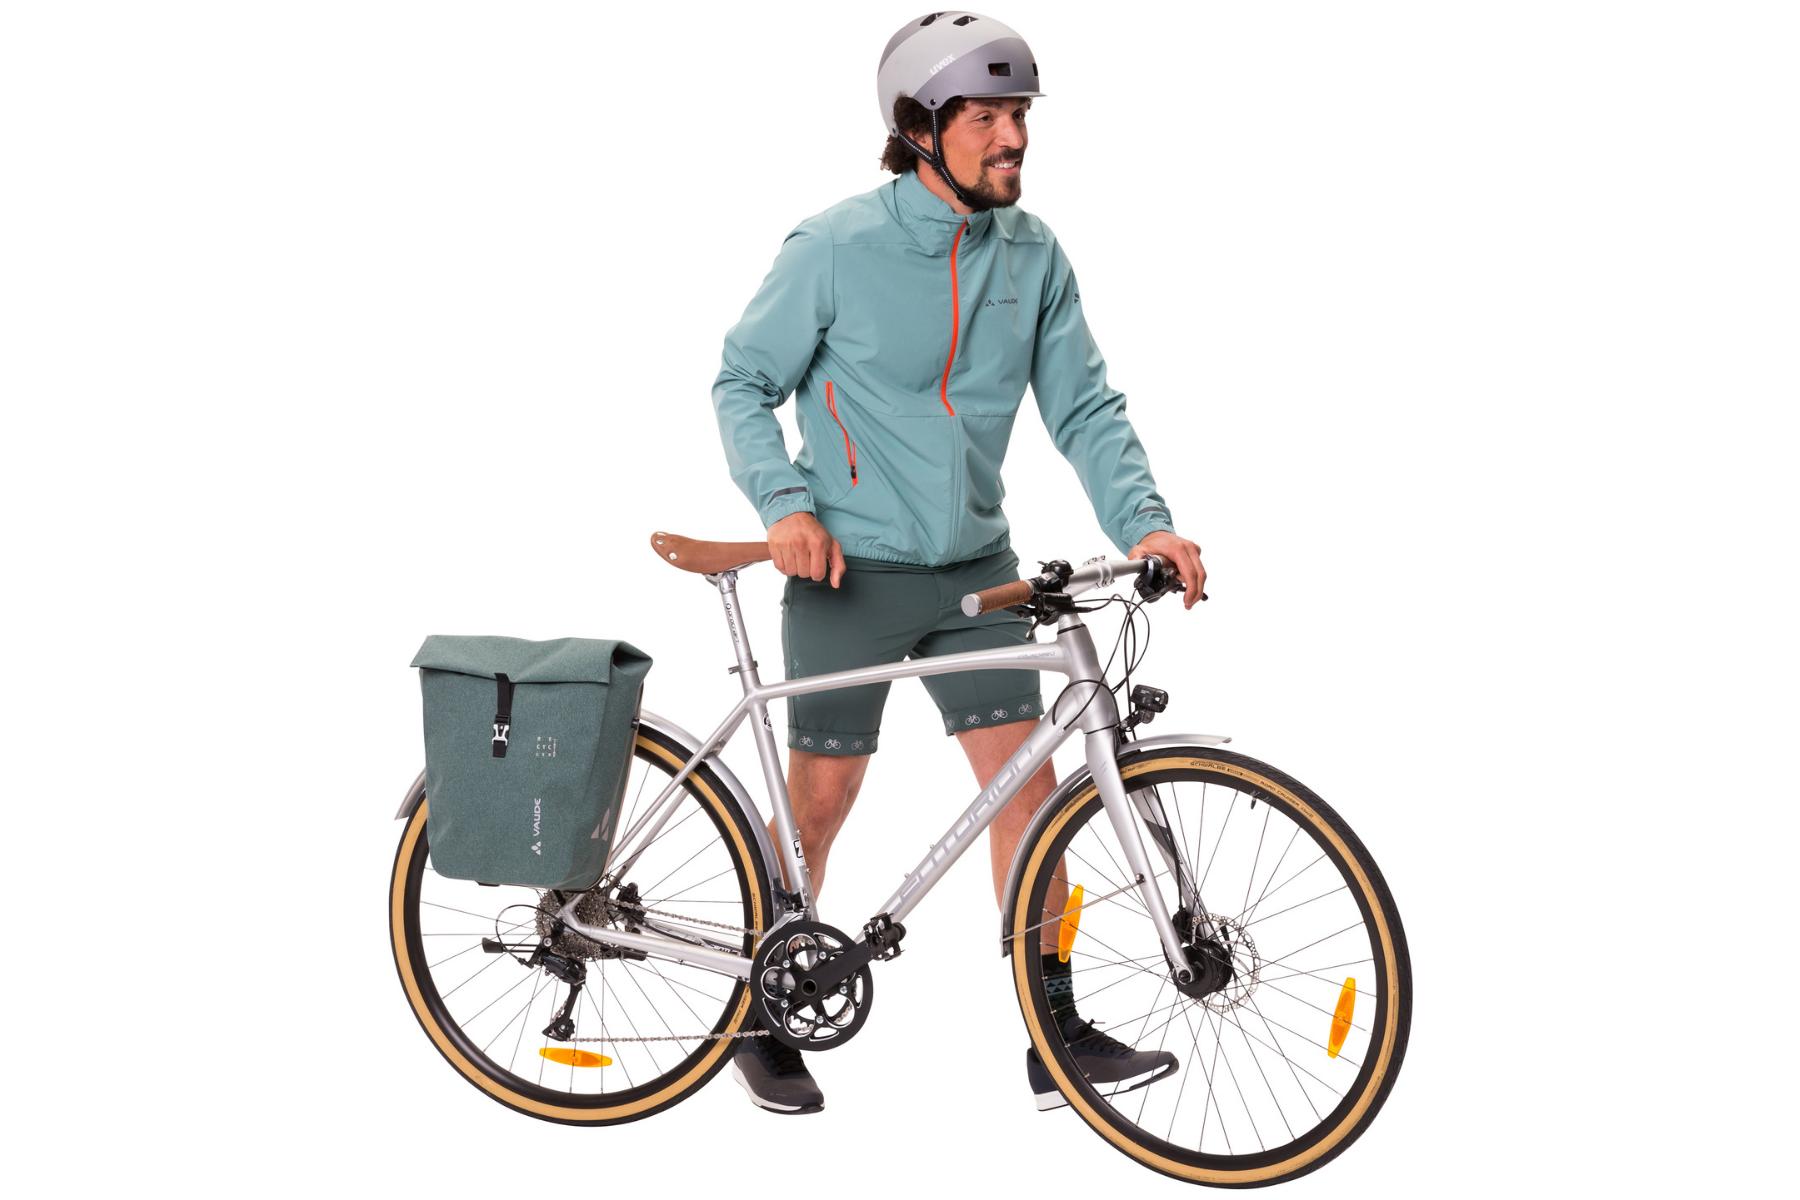 VAUDE bringt erste Fahrradtasche aus Recycling-Material auf den Markt